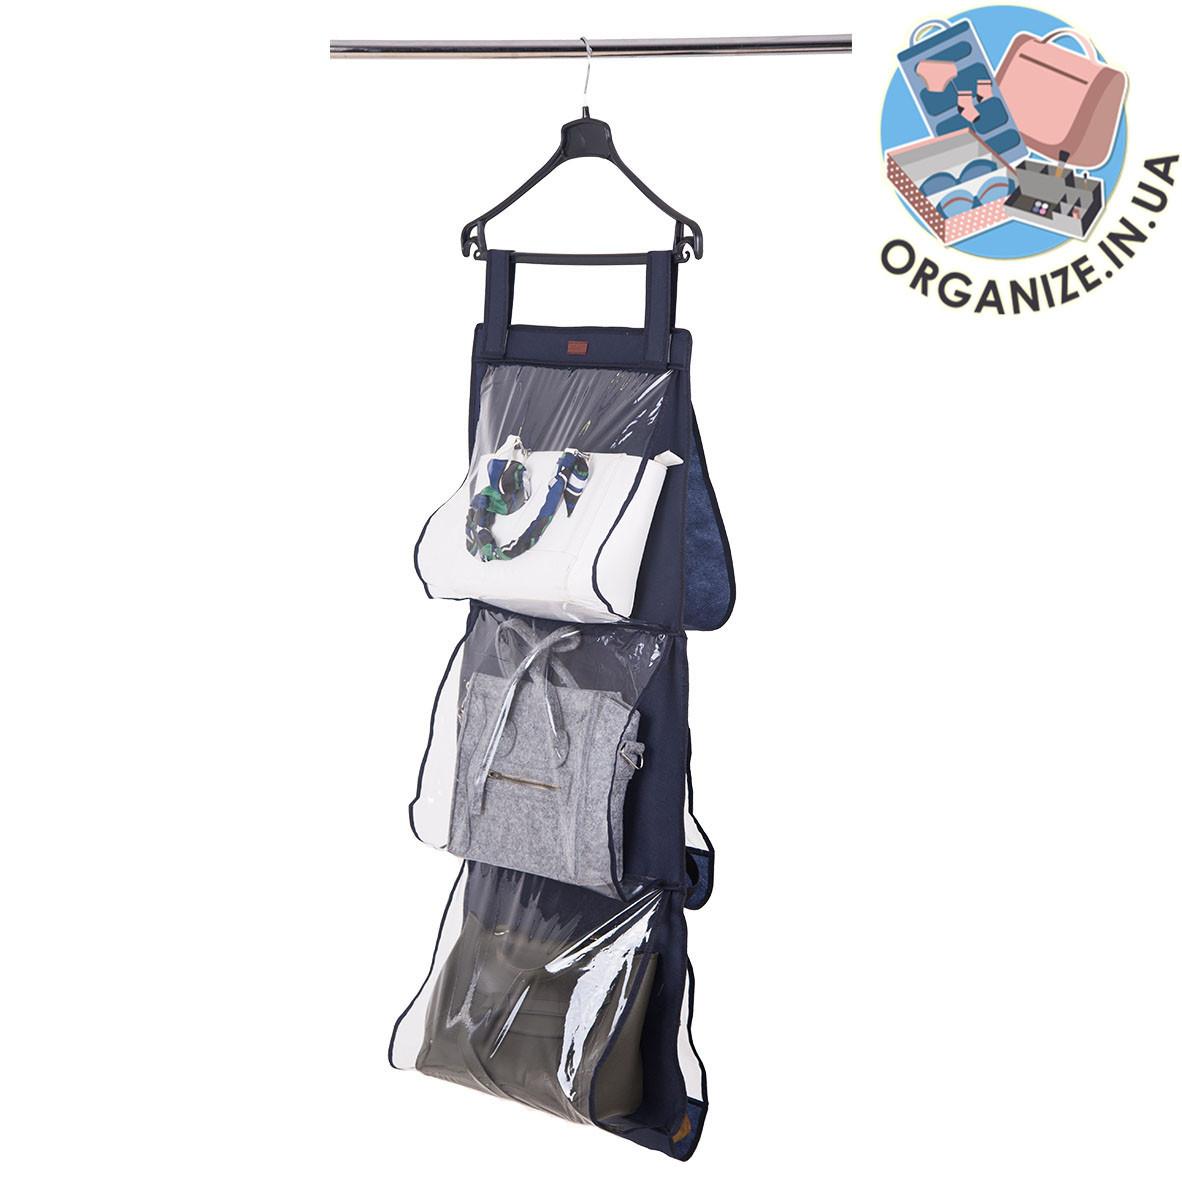 Подвесной кофр для хранения сумок L ORGANIZE  (синий)